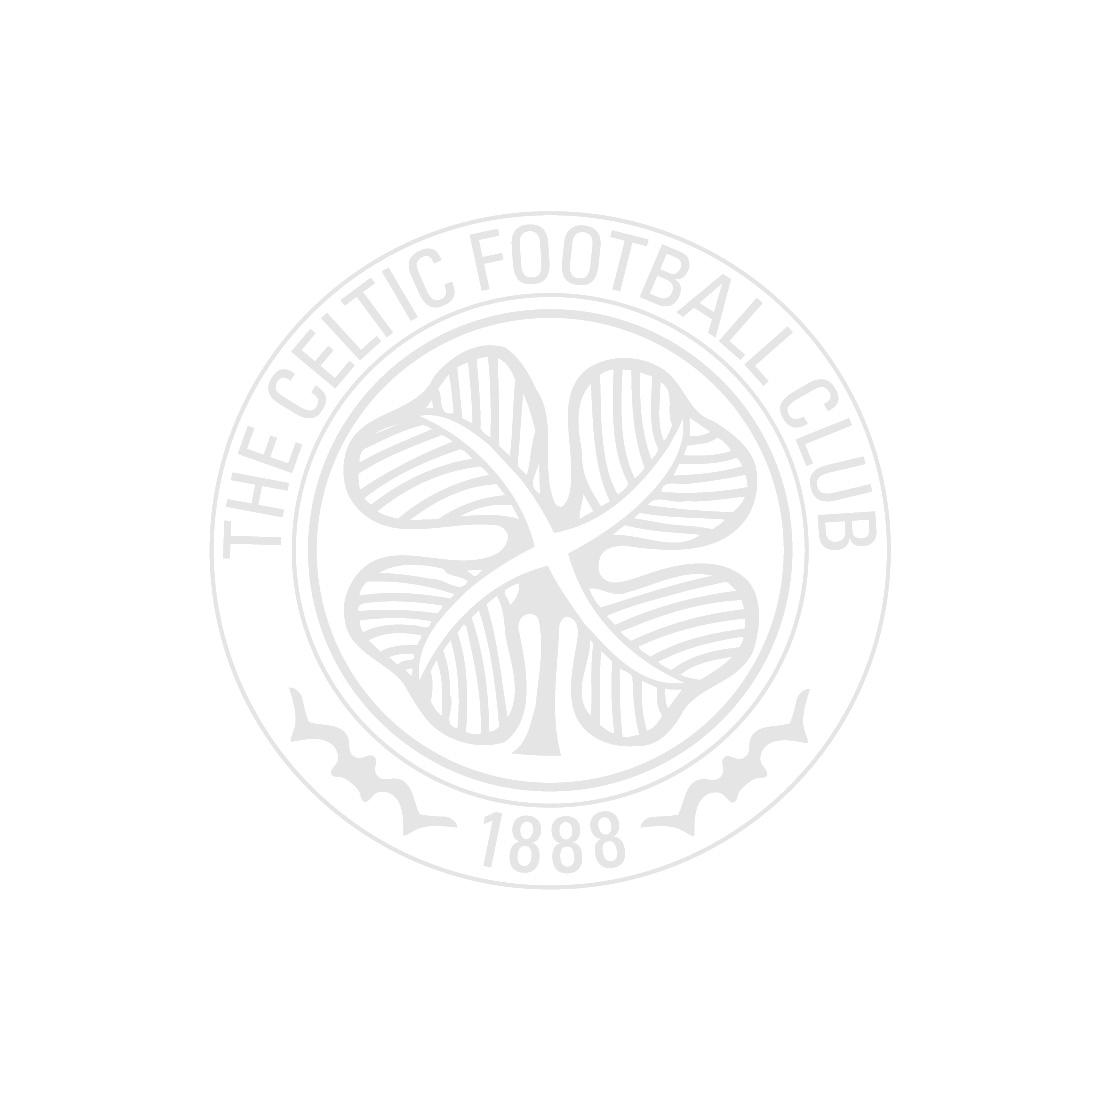 Celtic Mens Elite Home Shirt 19/20 with Sponsor